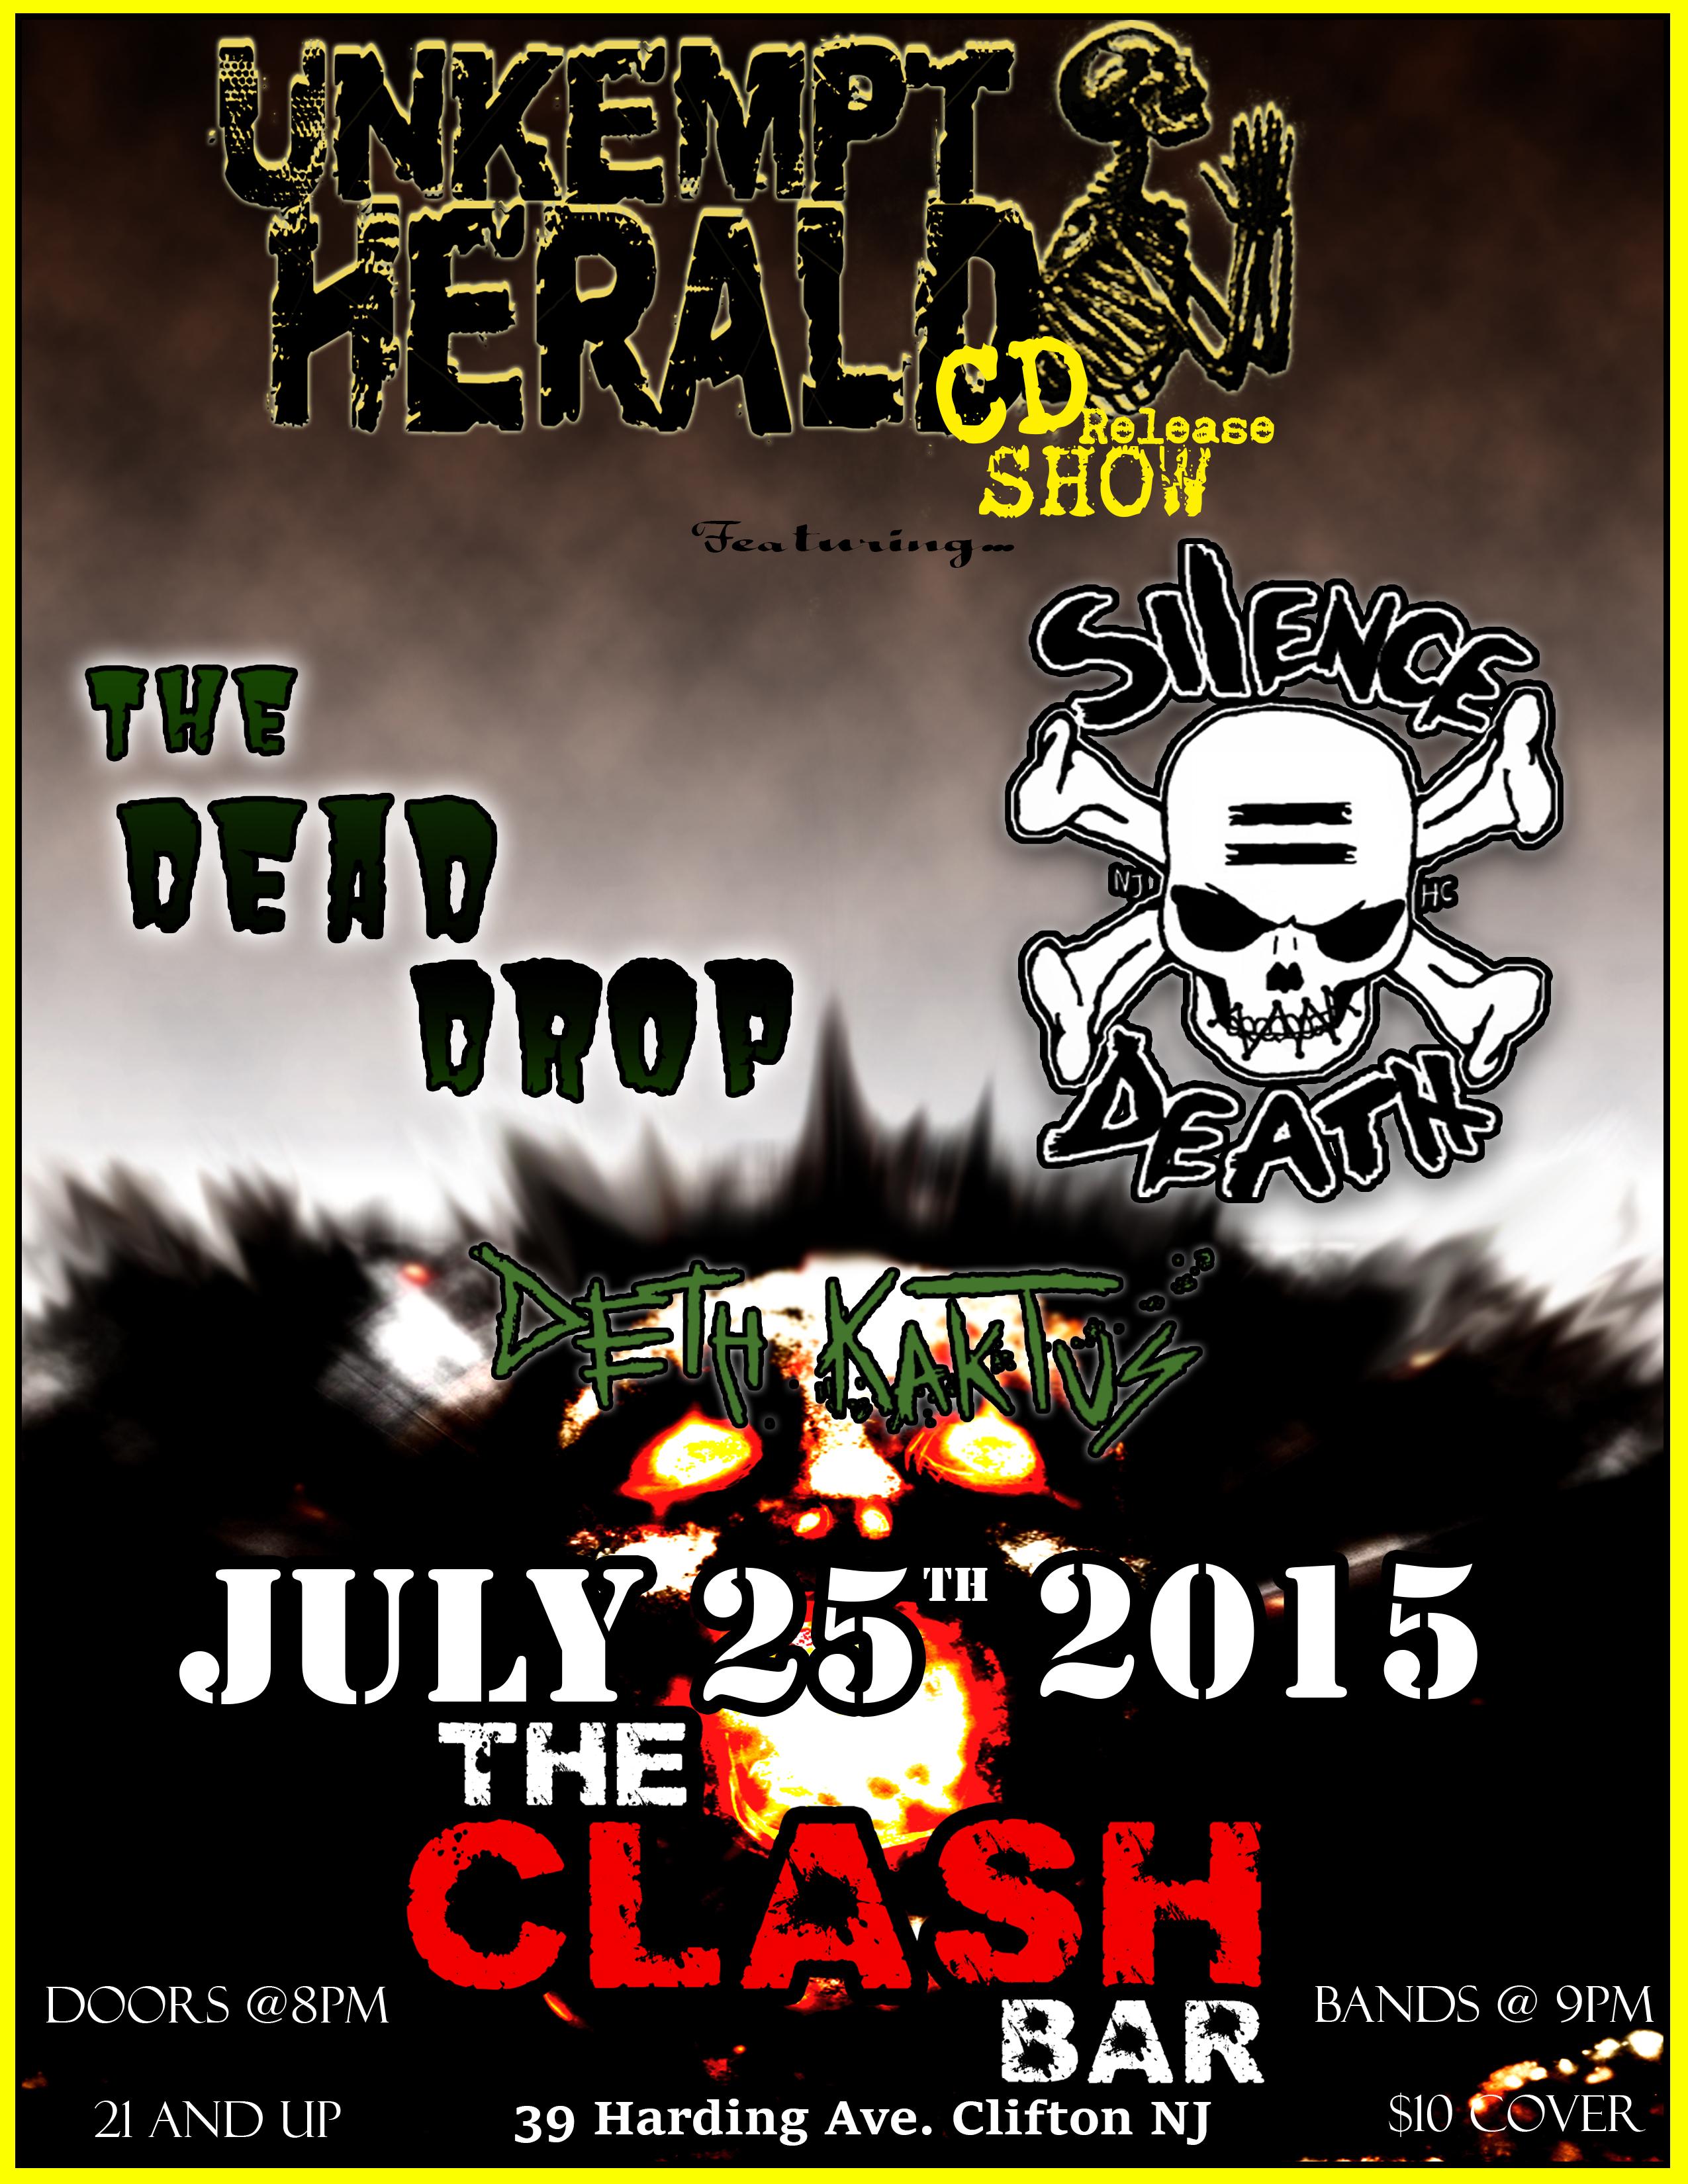 july 25 2015 flyer.jpg